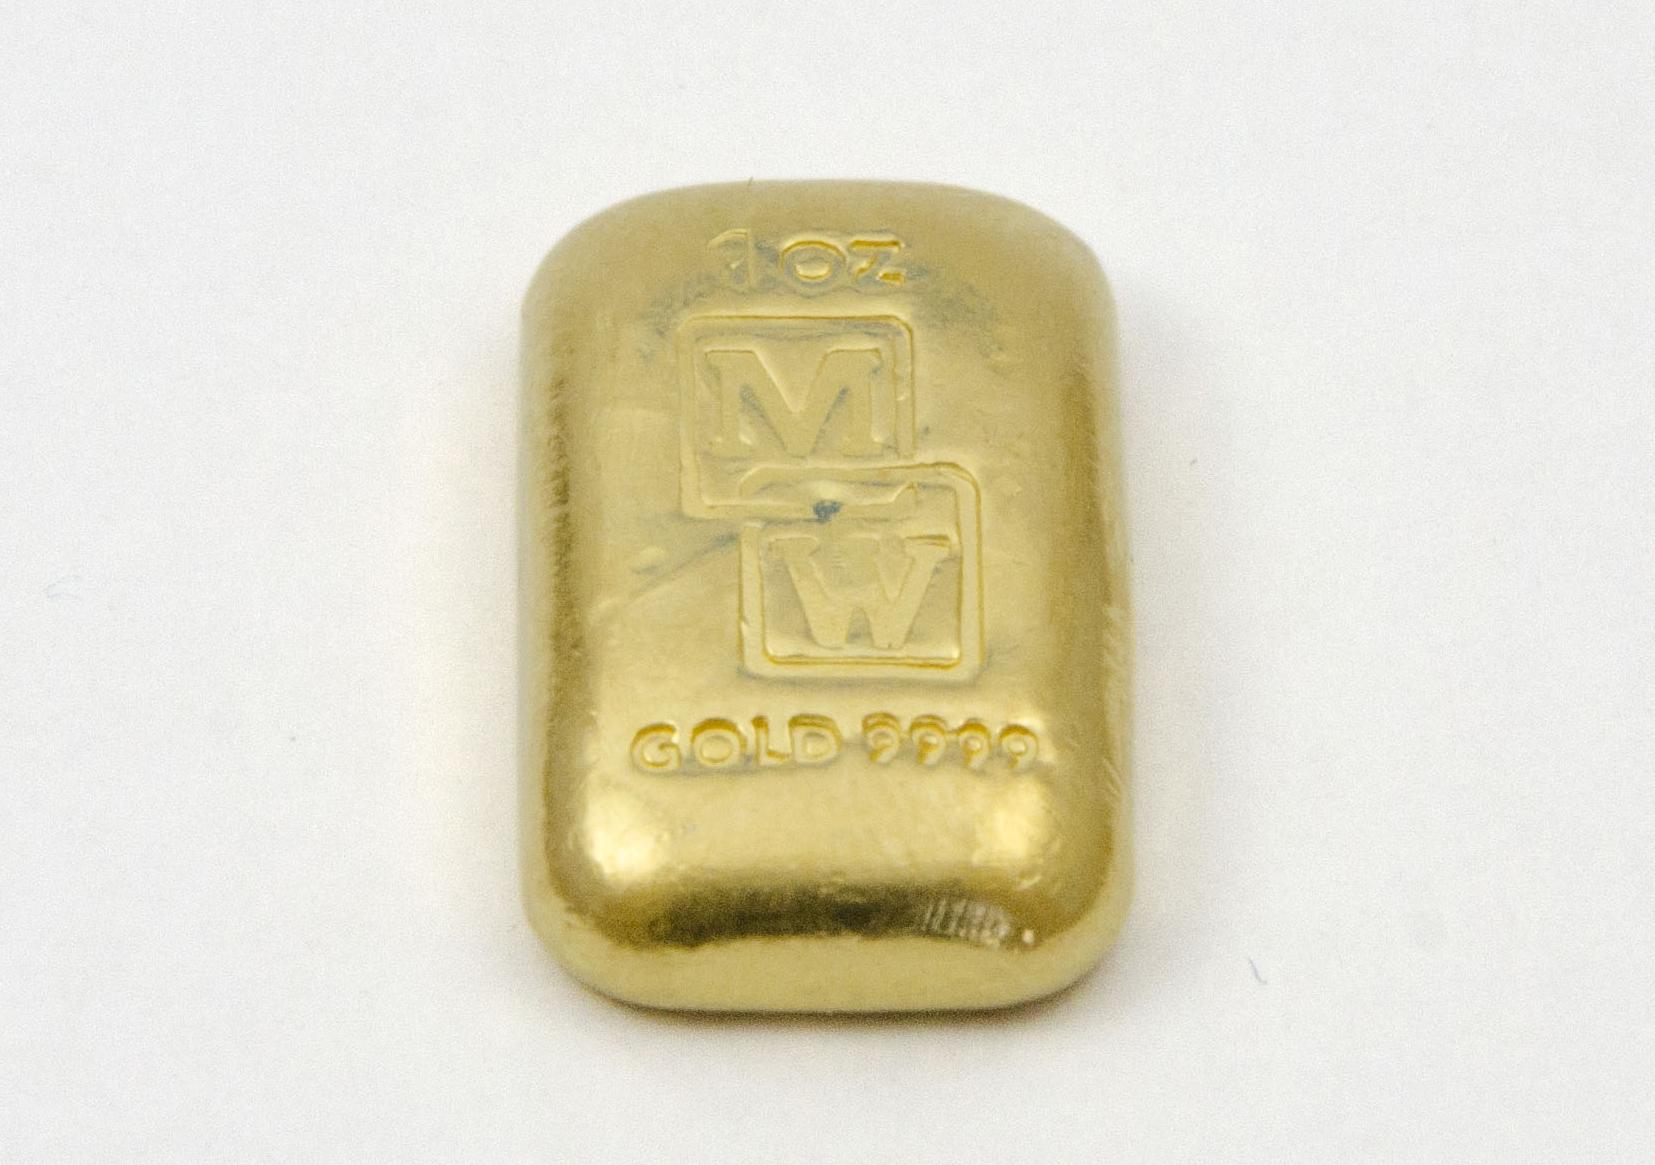 1oz Morris and Watson Cast  Fine Gold i ngot (31.10 grams).  Ingot dimensions (mm): 15(W) x 25(H) x 5(D)